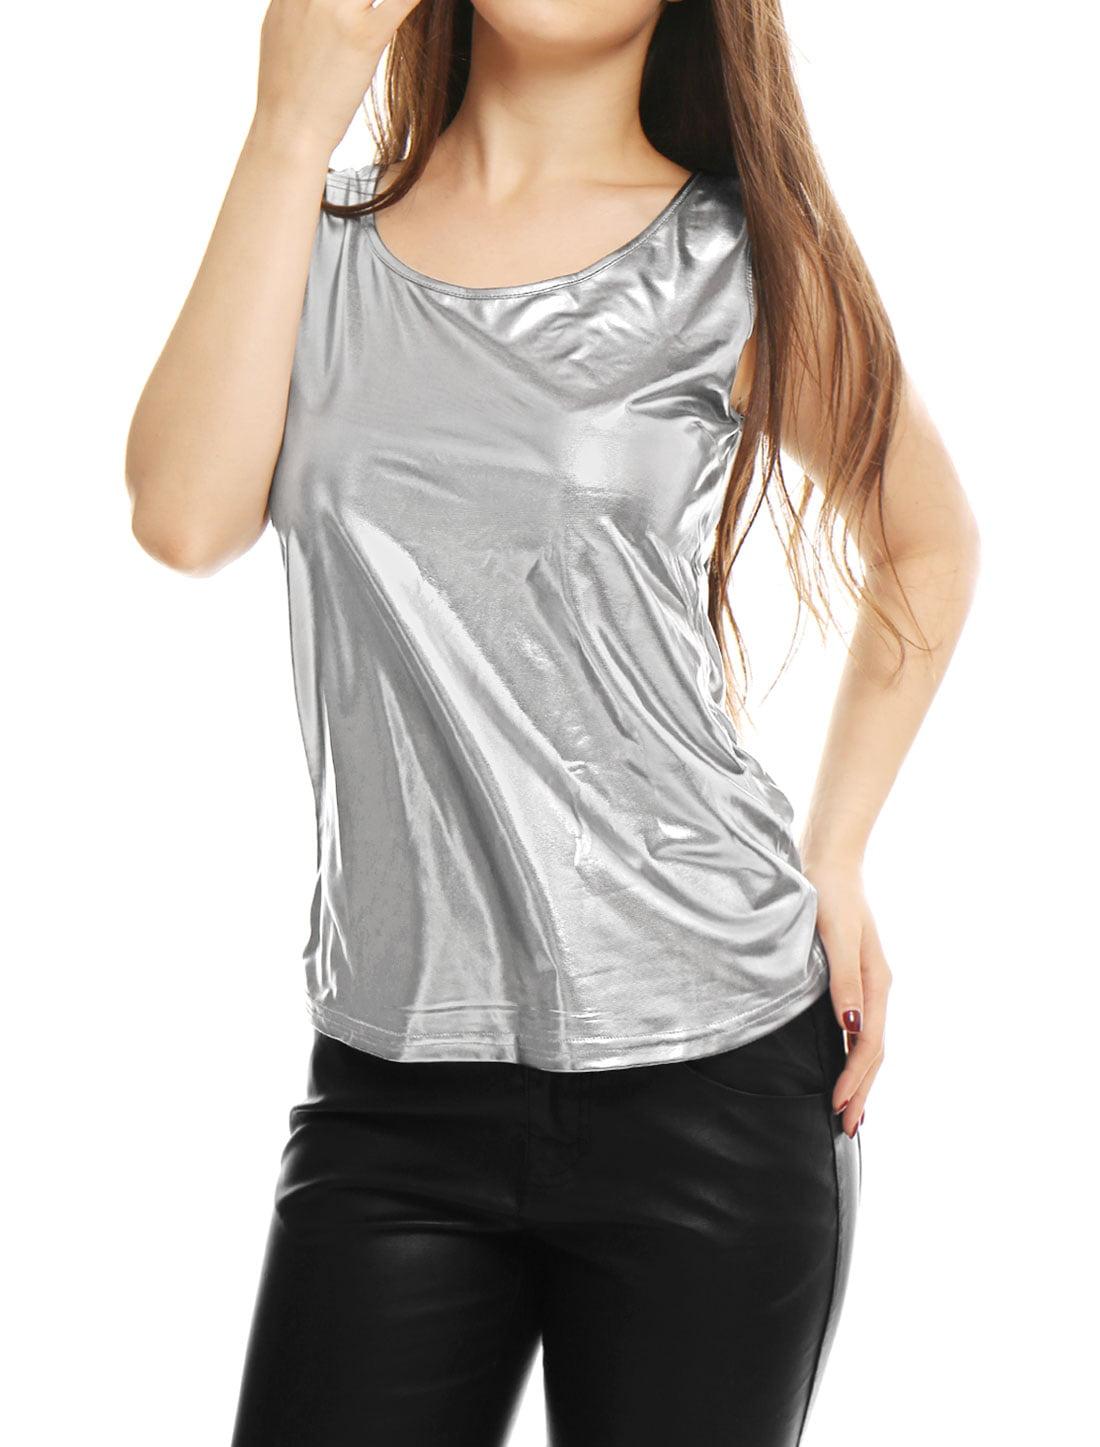 Women's U Neck Stretch Slim Fit Metallic Tank Top